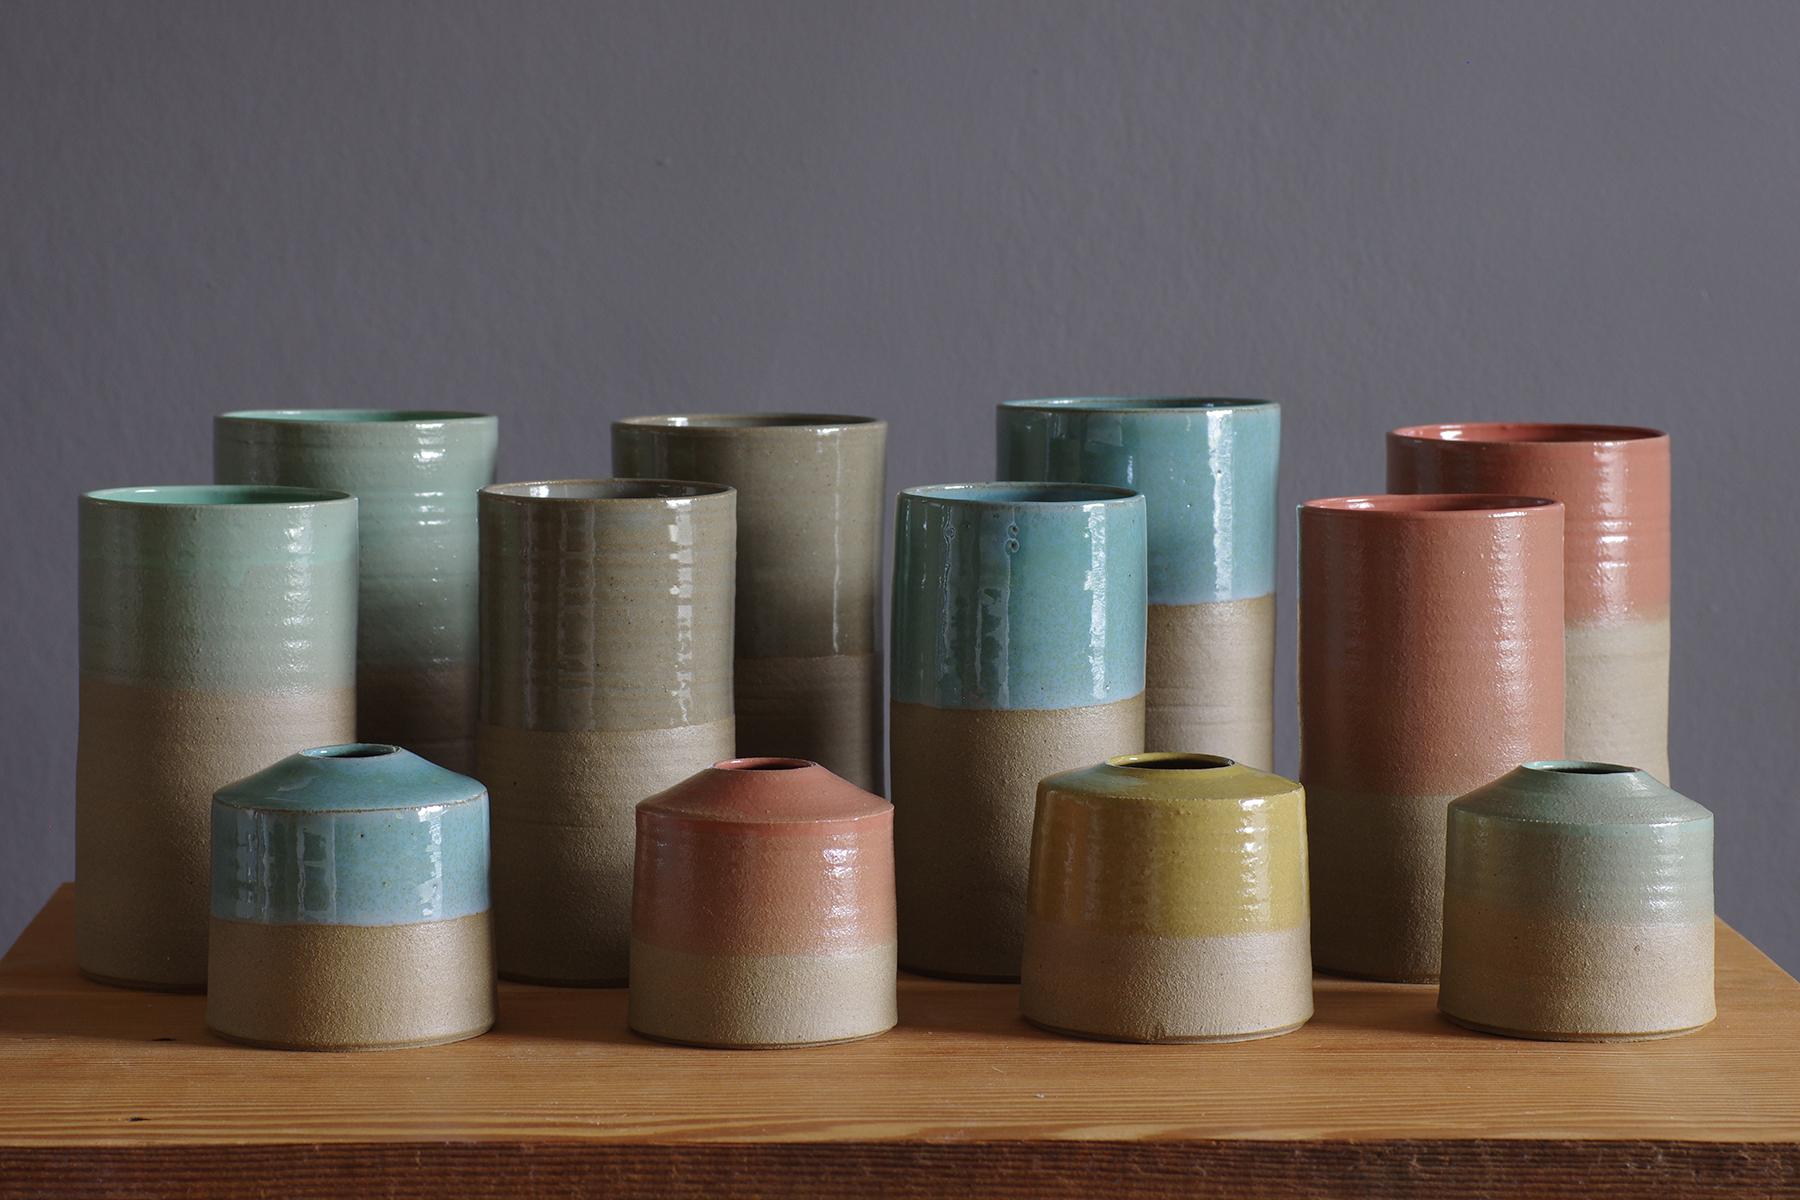 vitrifiedstudio - west elm local - custom order in custom colors